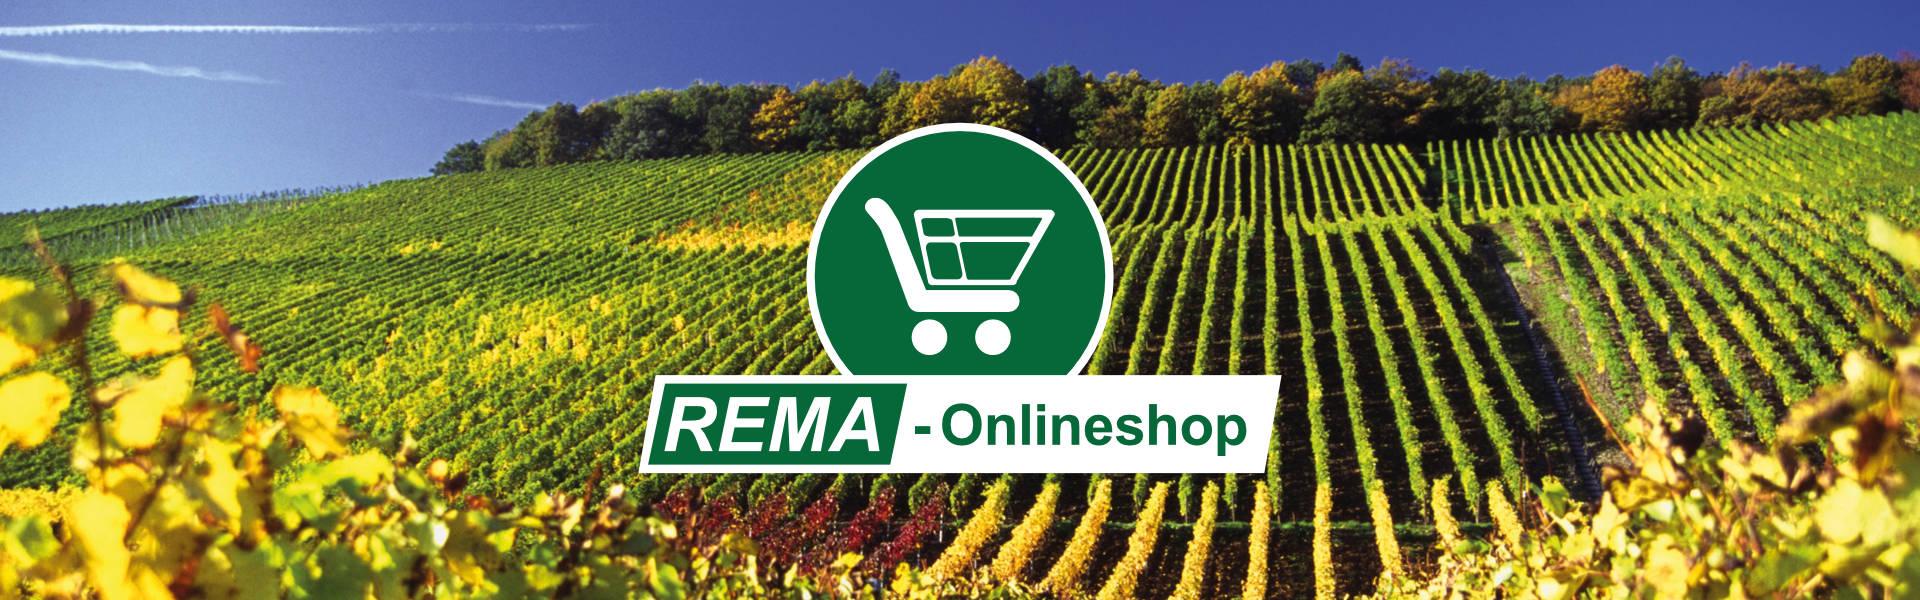 REMA Onlineshop